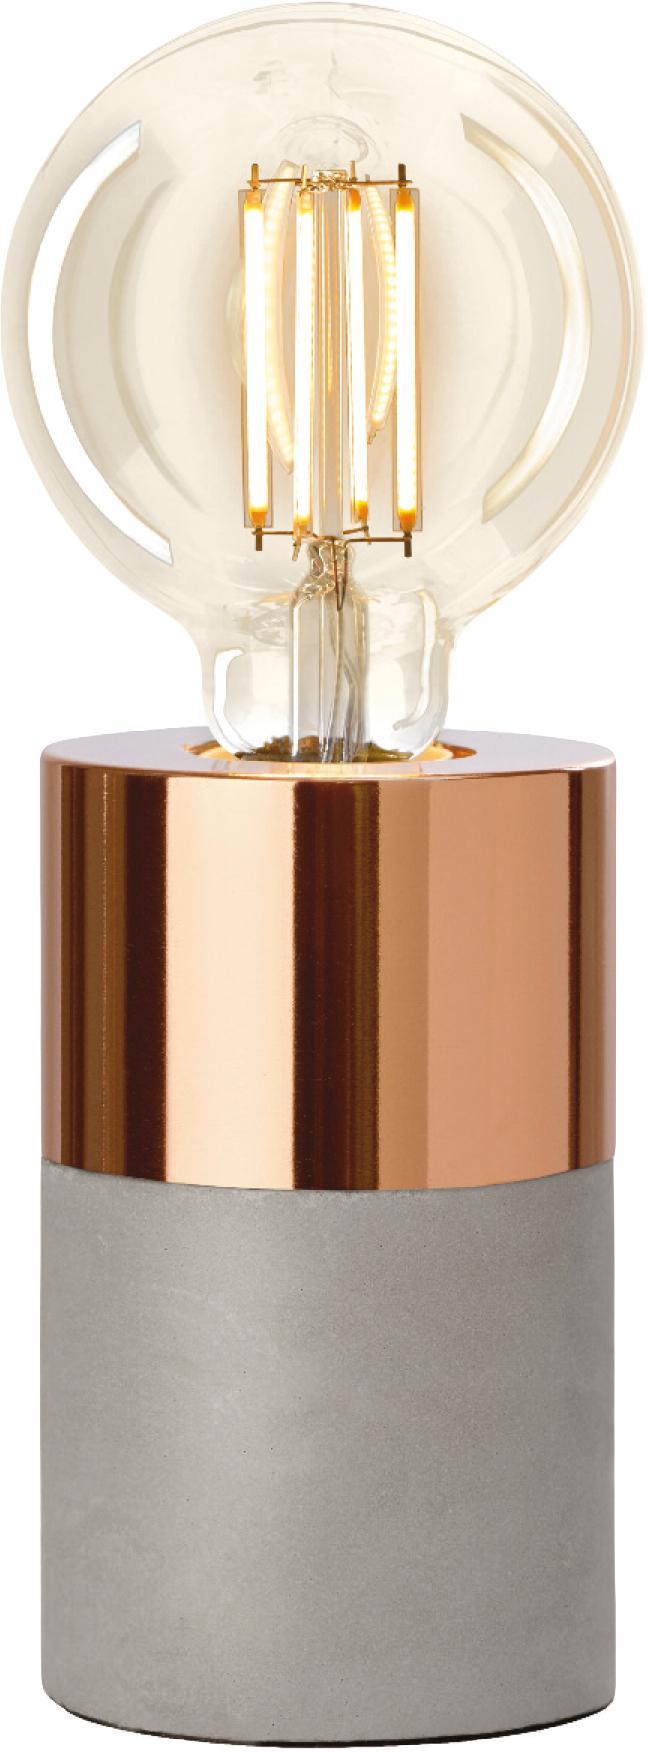 Lampada da tavolo con base in cemento Athen, Grigio, rame, Ø 8 x Alt. 14 cm